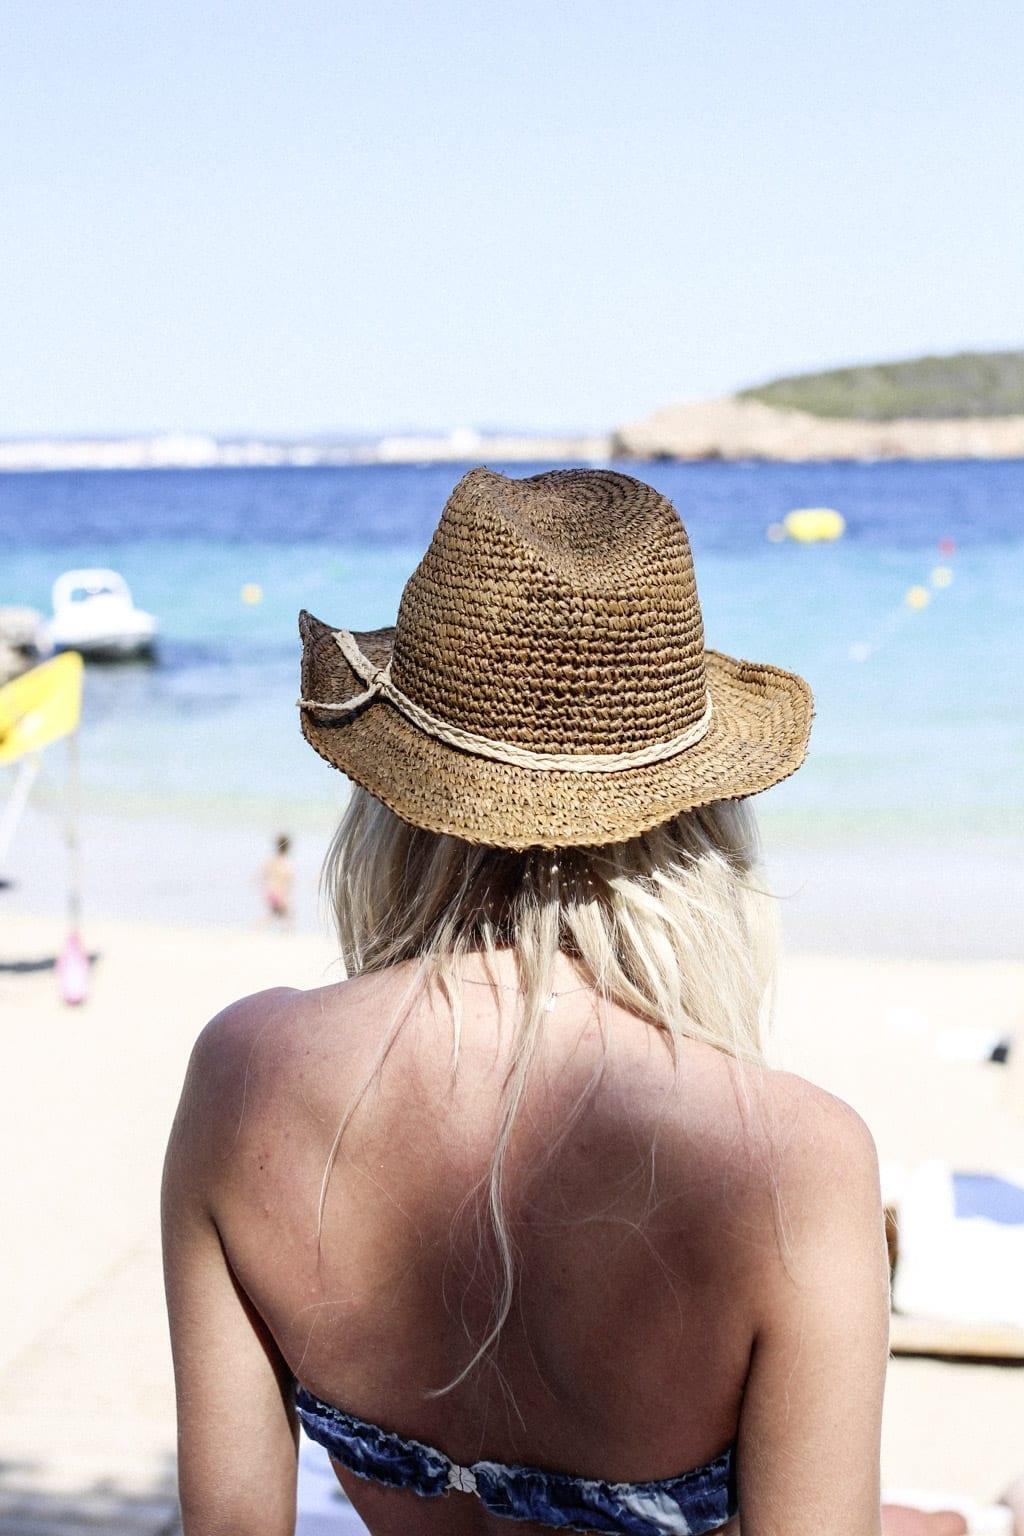 CK1605_Constantly-Cala-Bassa-Beach-Club-Ibiza-Spain-8062